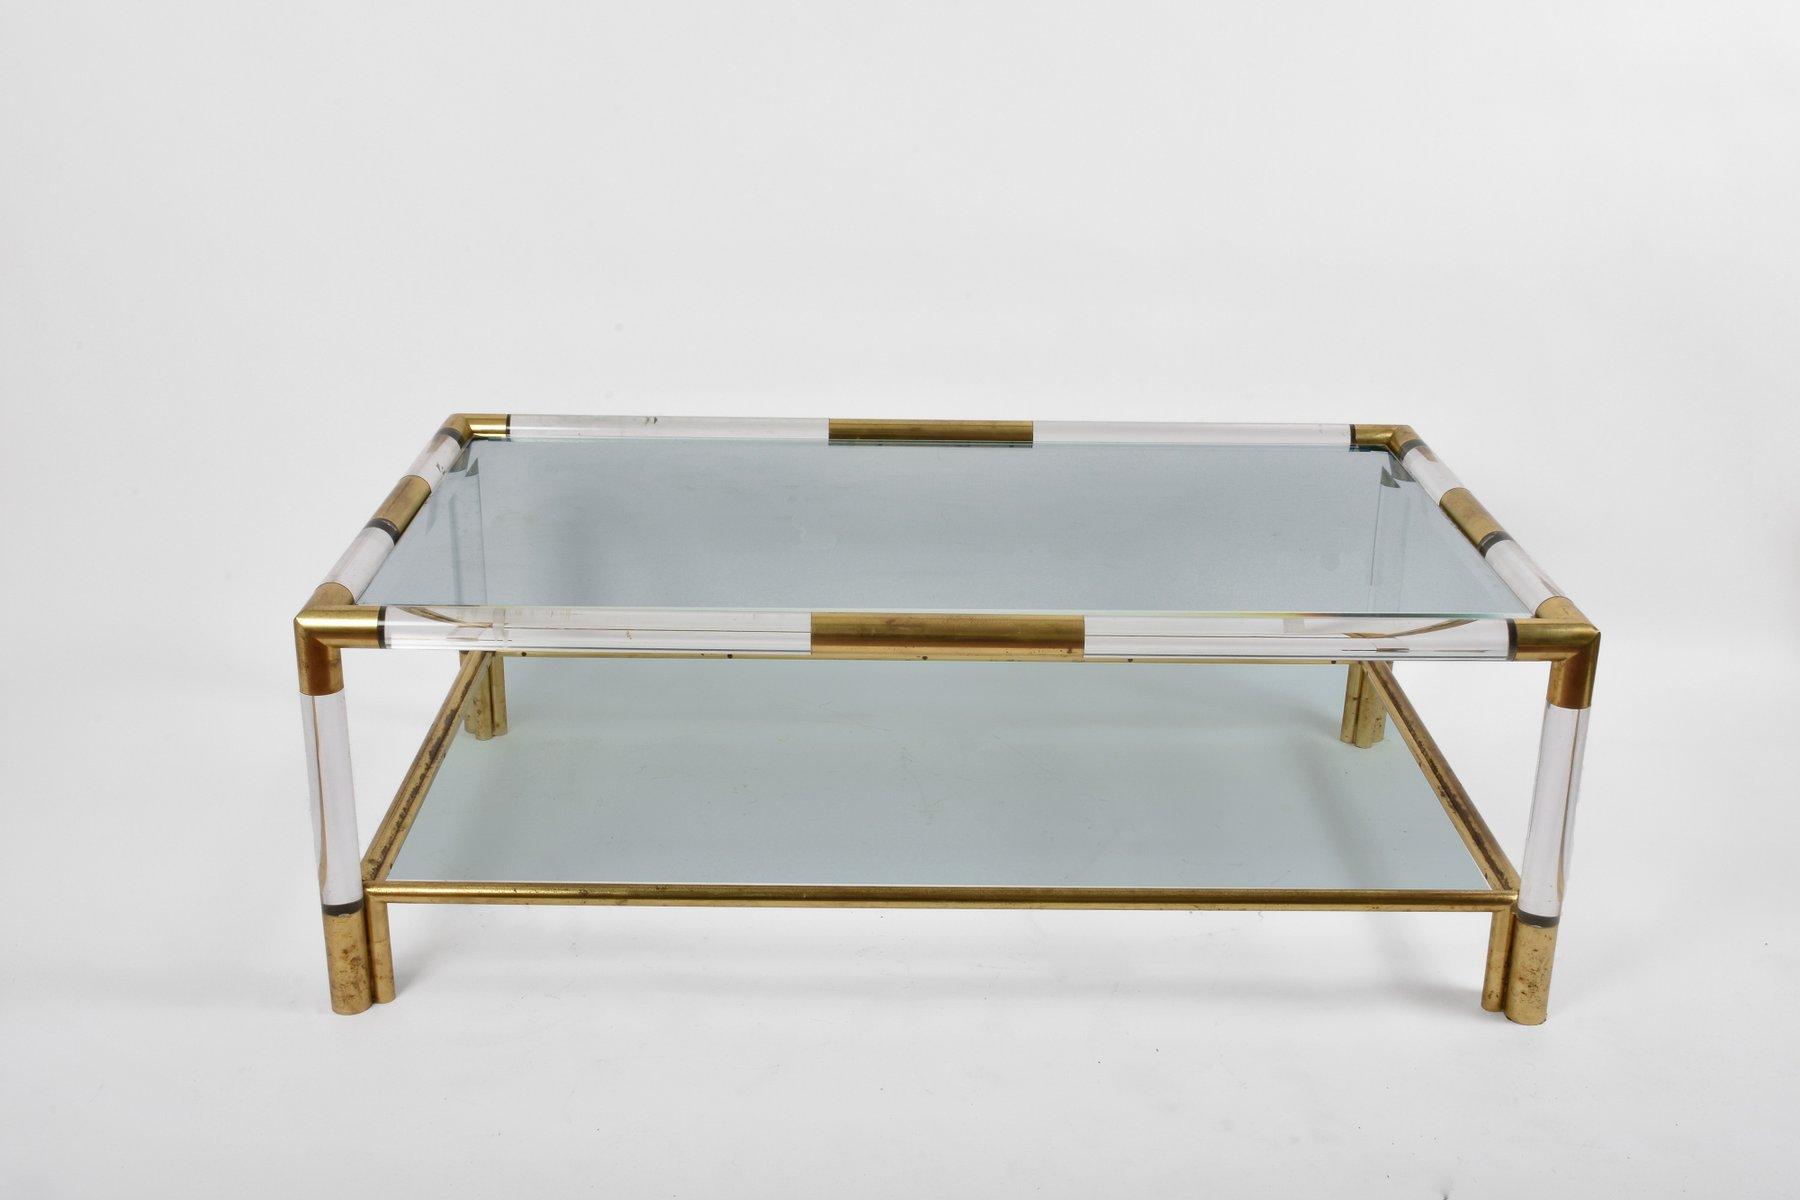 Couchtisch acryl gallery of glas acryl couchtisch klar cm for Couchtisch acryl